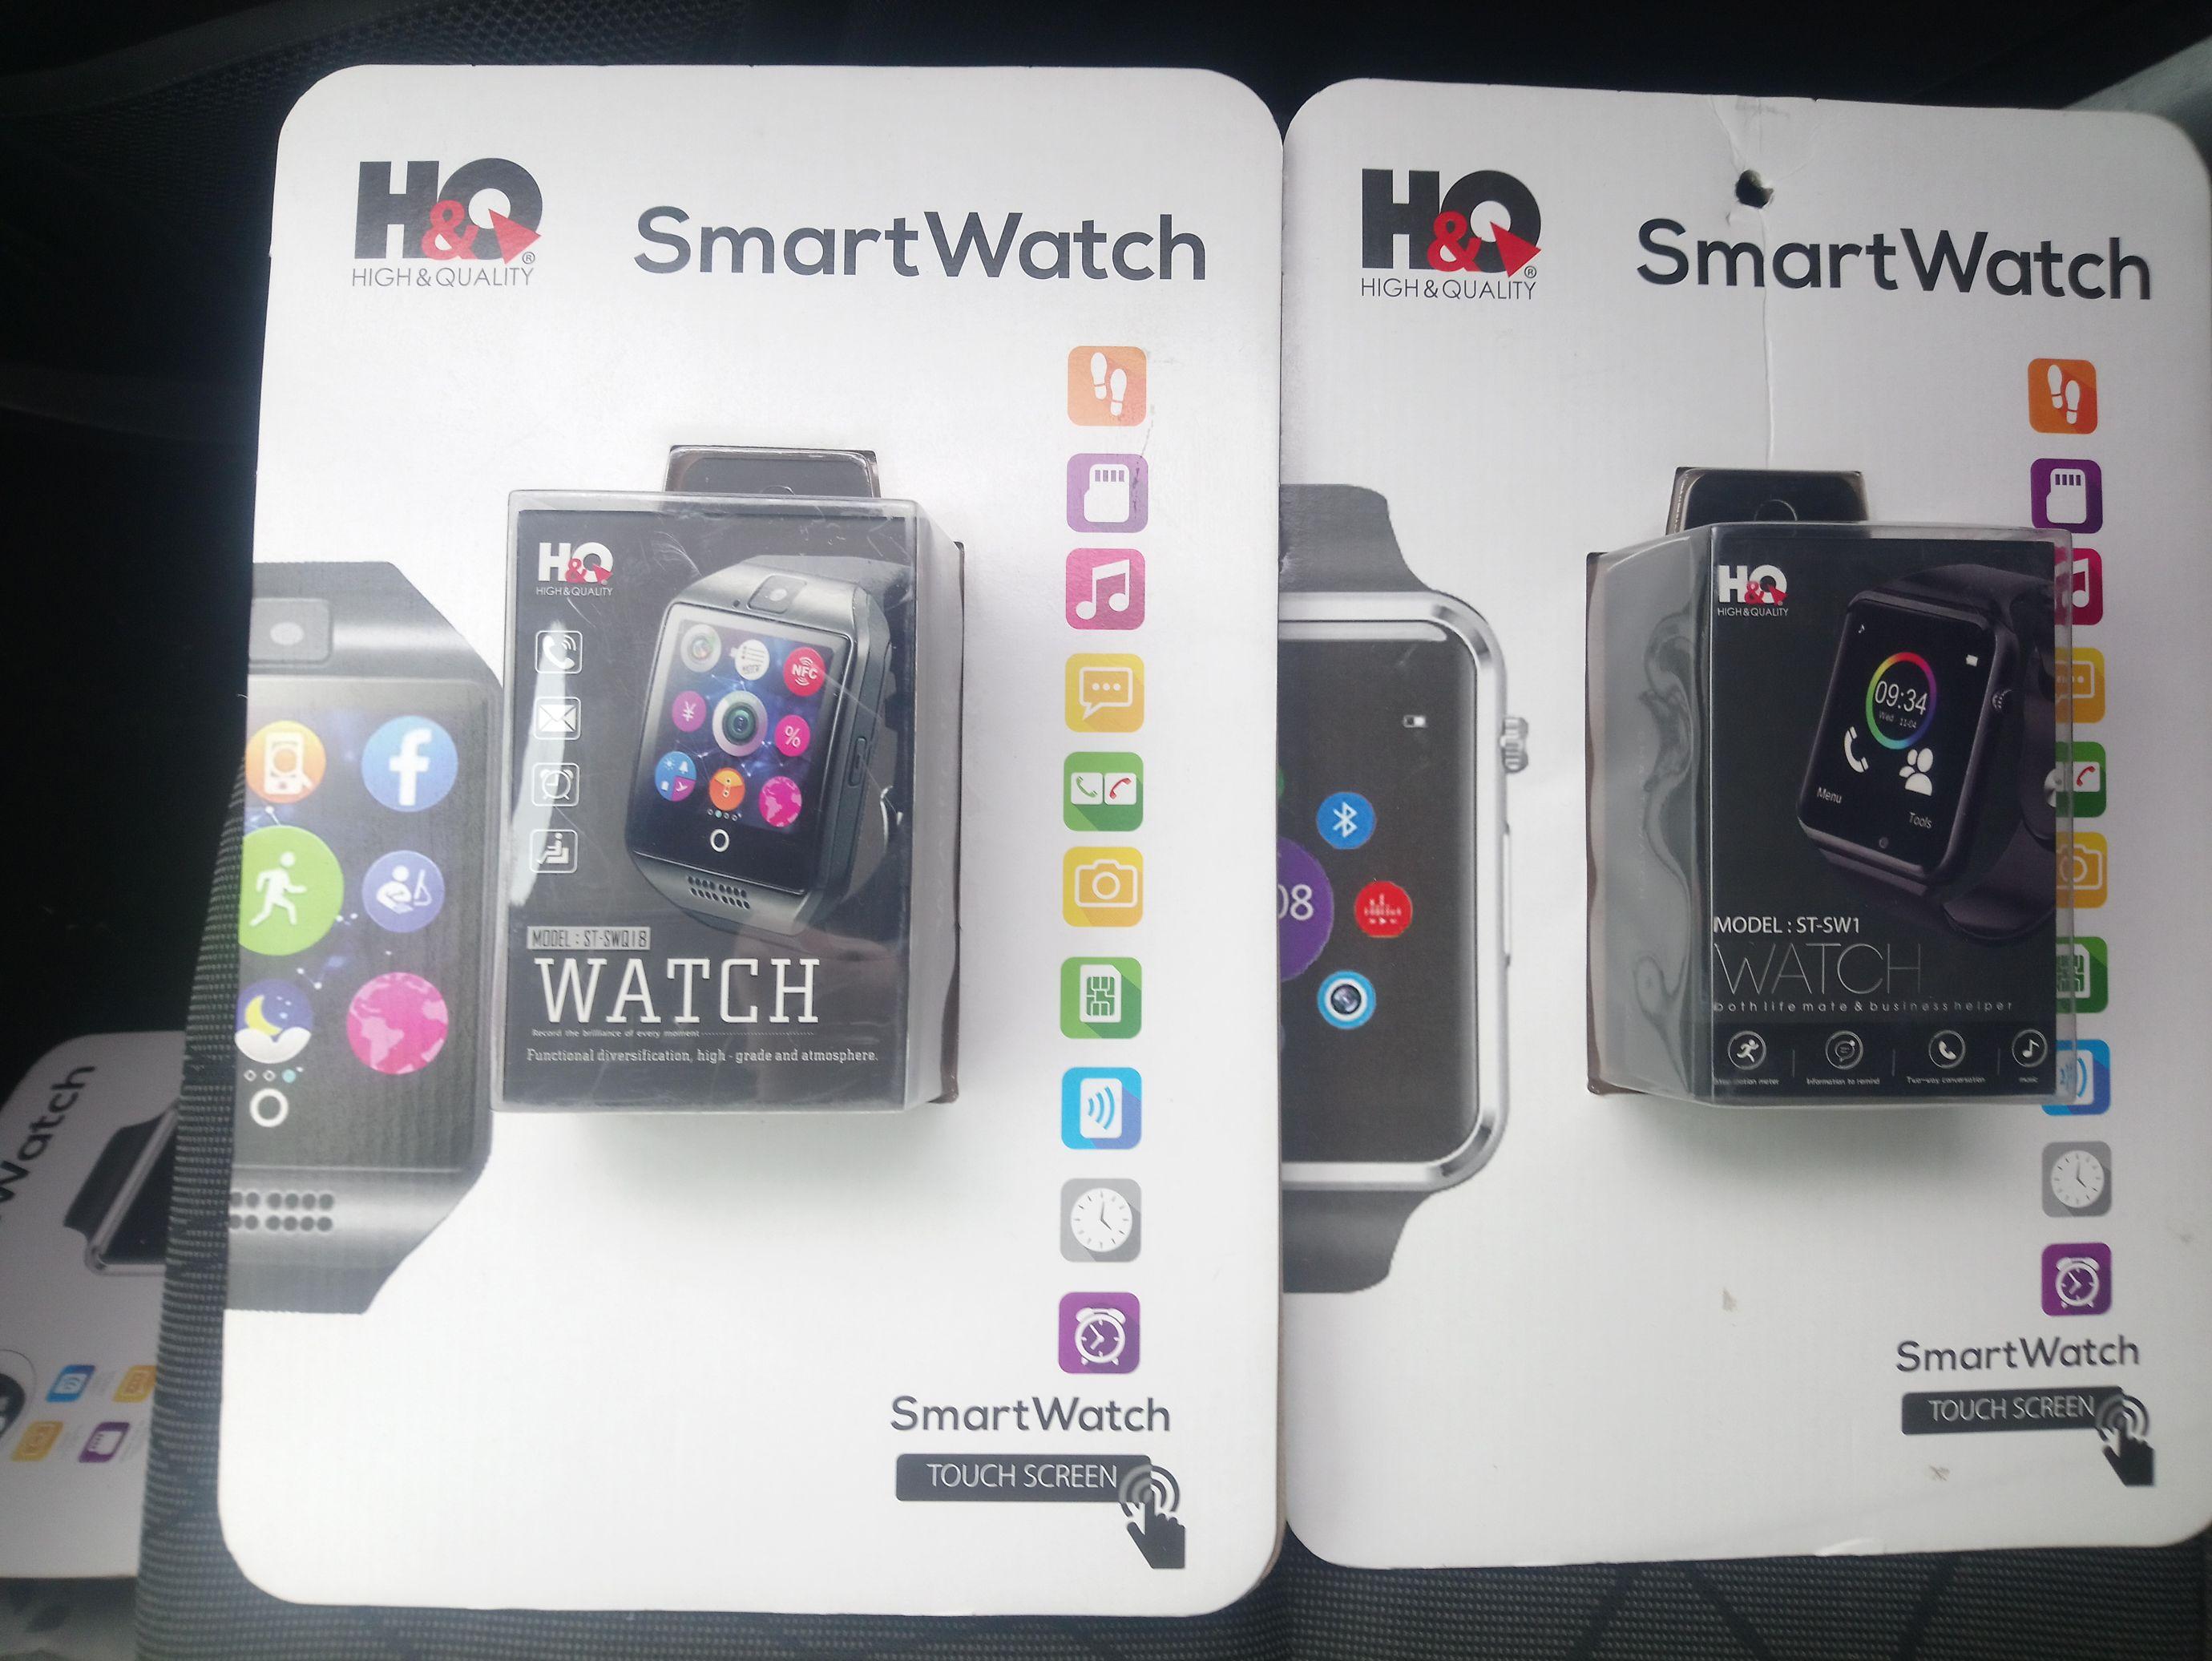 Bodega Aurrera: Smartwatch H&Q (reloj inteligente)